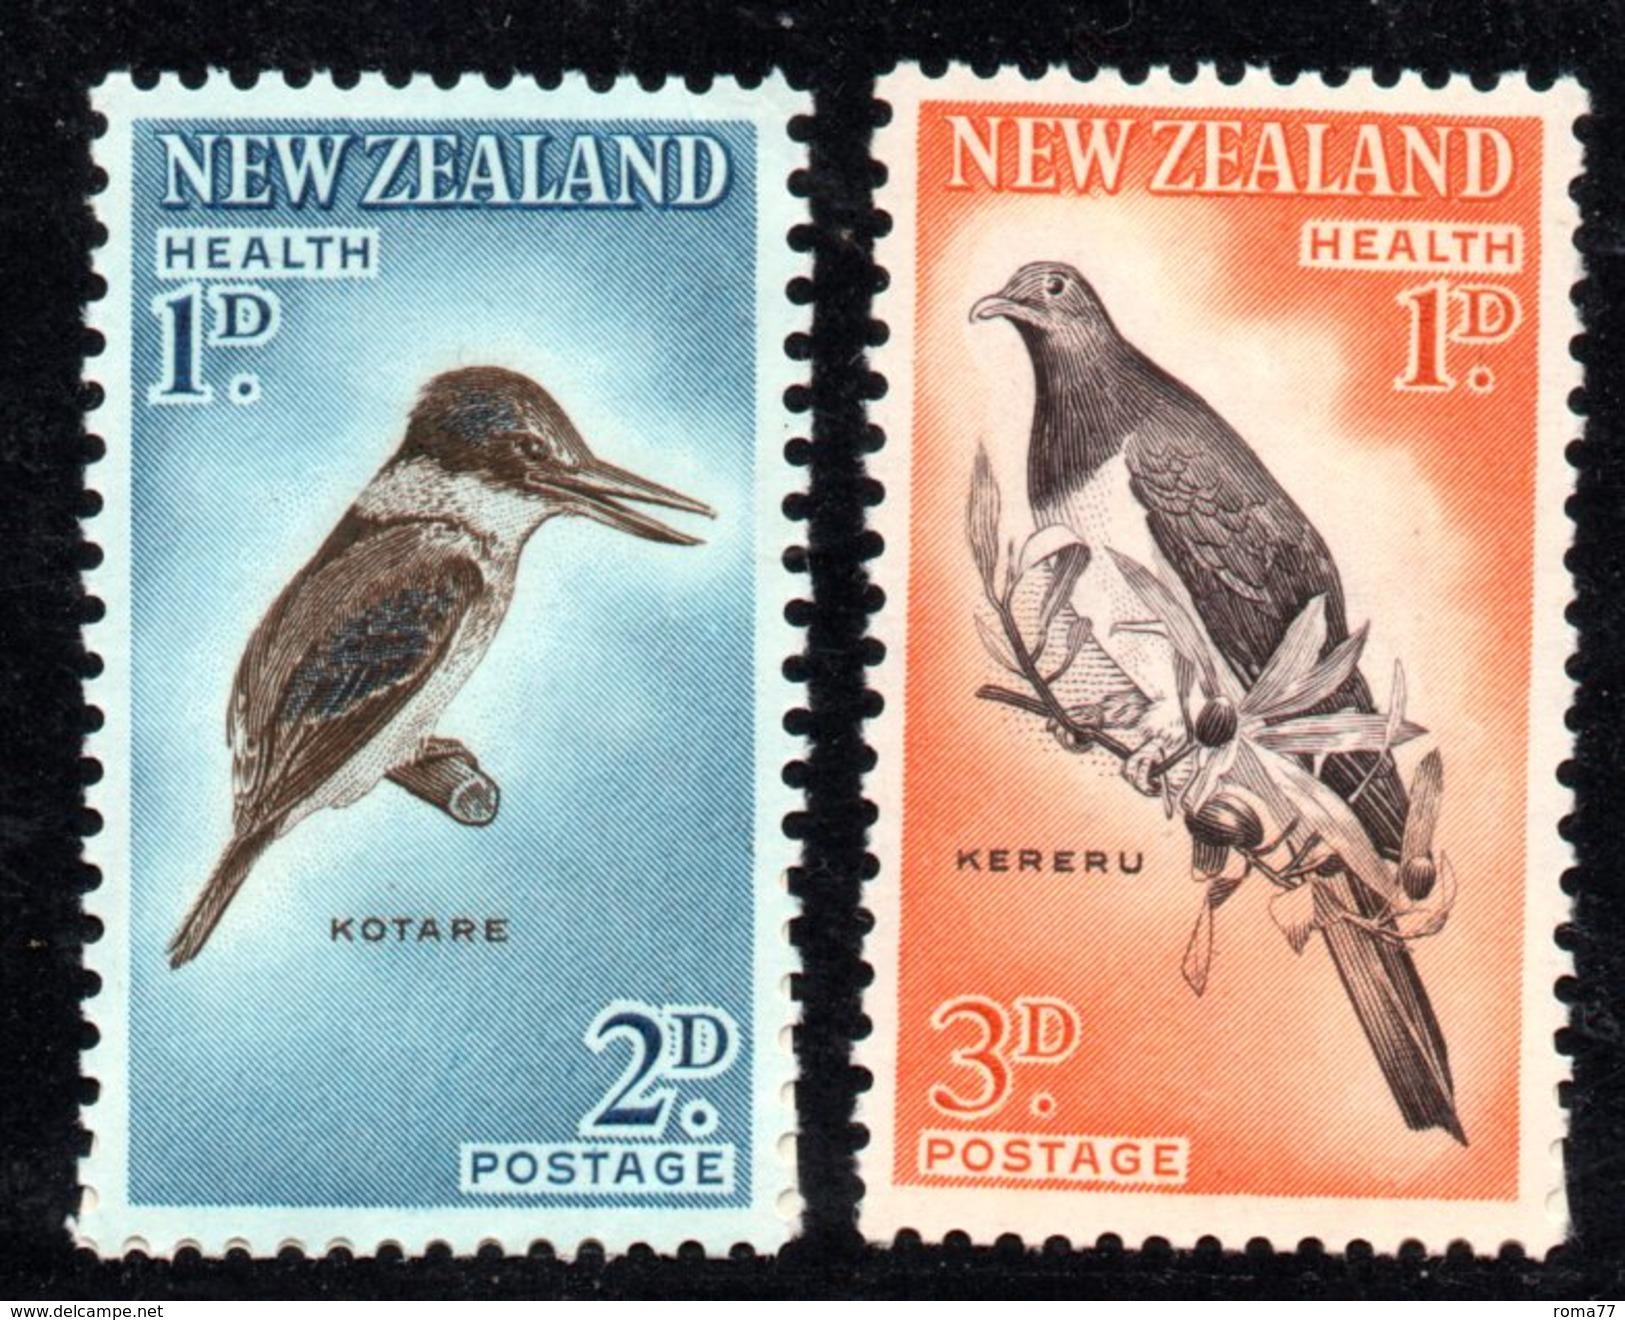 XP2565 - NUOVA ZELANDA 1960 , Yvert Serie 402a/403a  Dent 11 1/2x 11  ***  MNH . - Nuova Zelanda